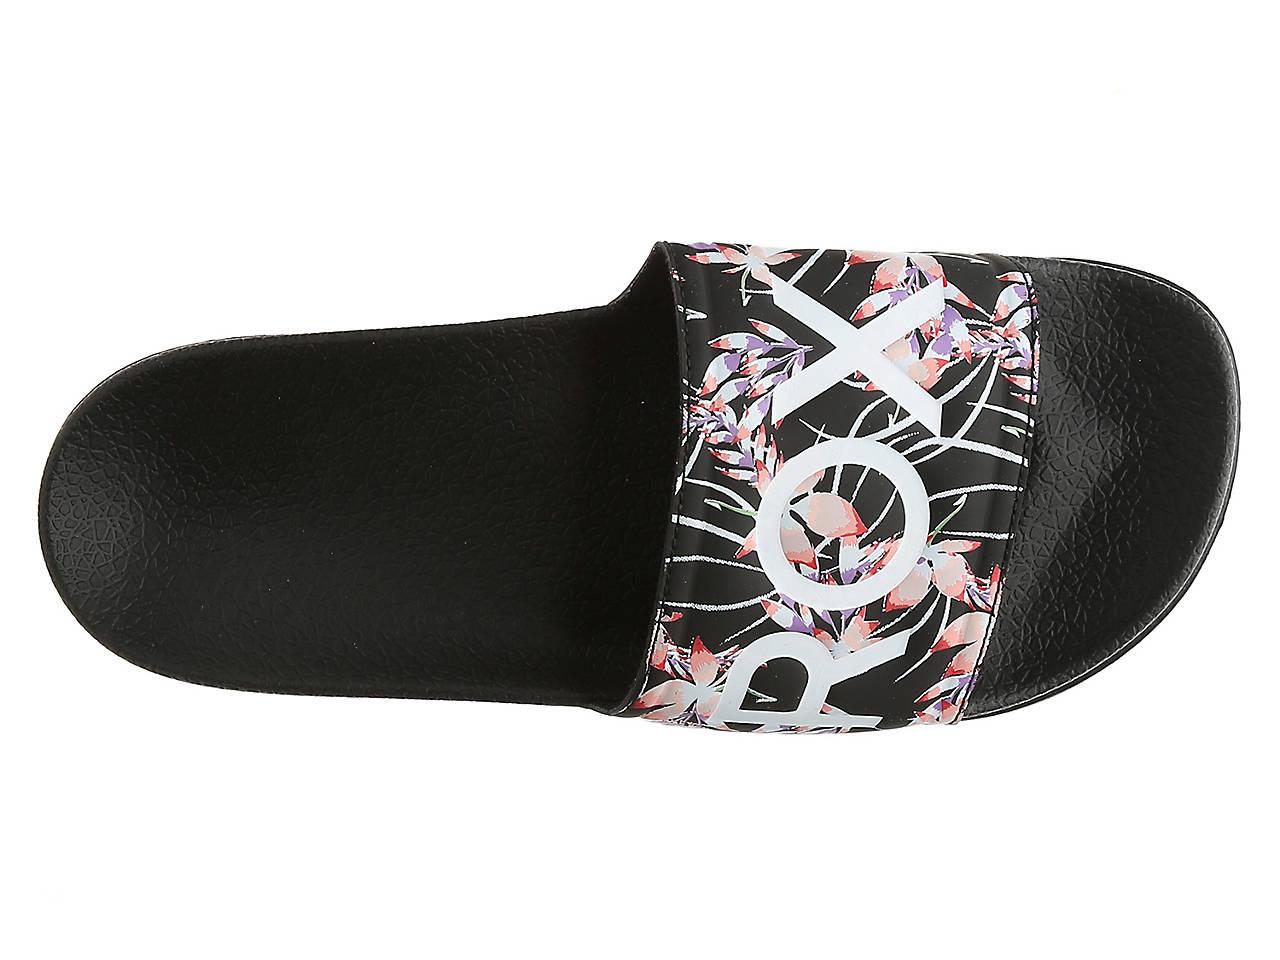 82abfdbc46c2 Roxy Slippy Slide Sandal Women s Shoes